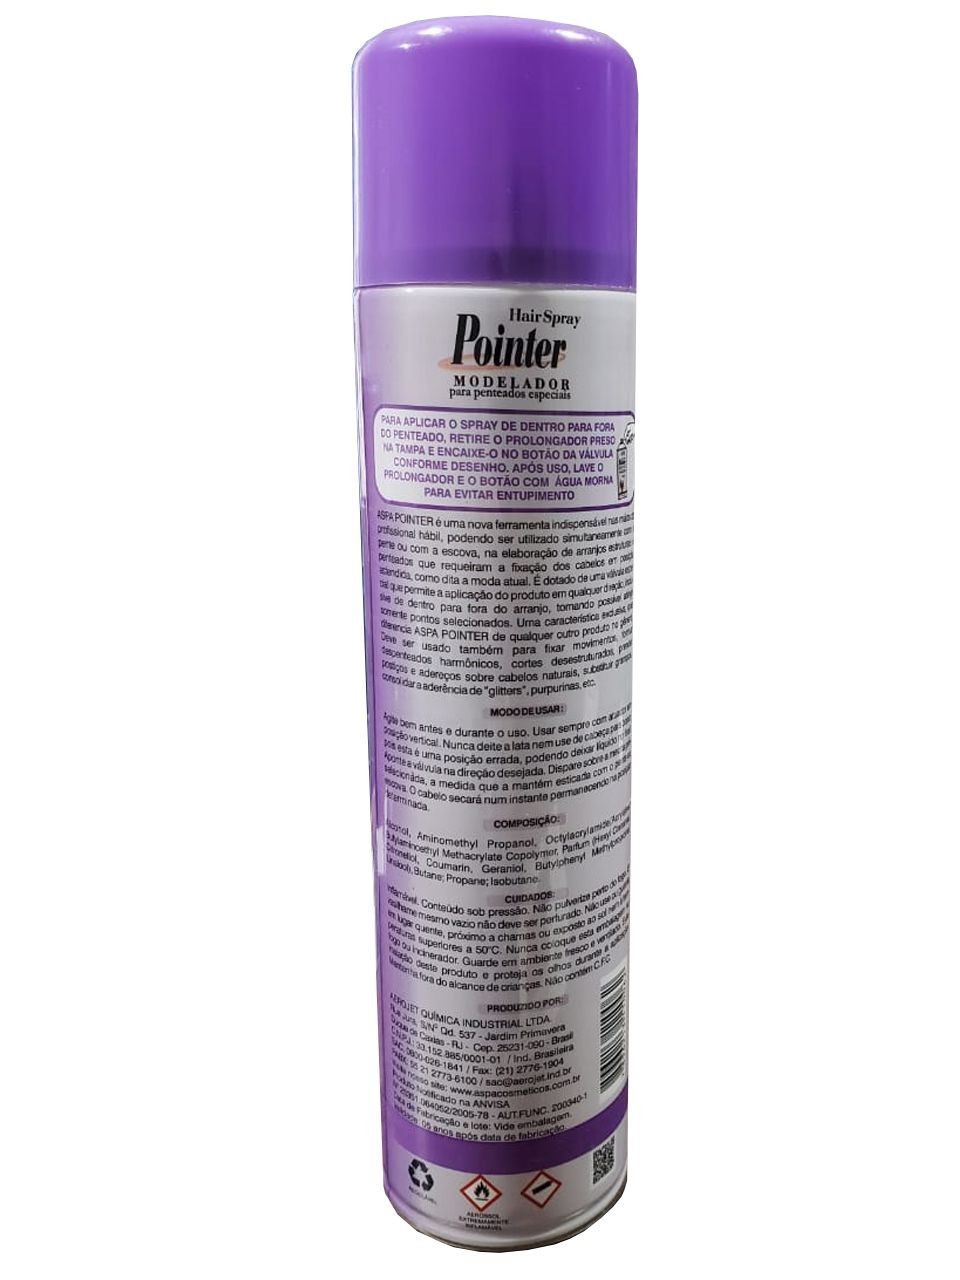 Kit 6 Und Spray Aspa Pointer Modelador De Penteados 300ml